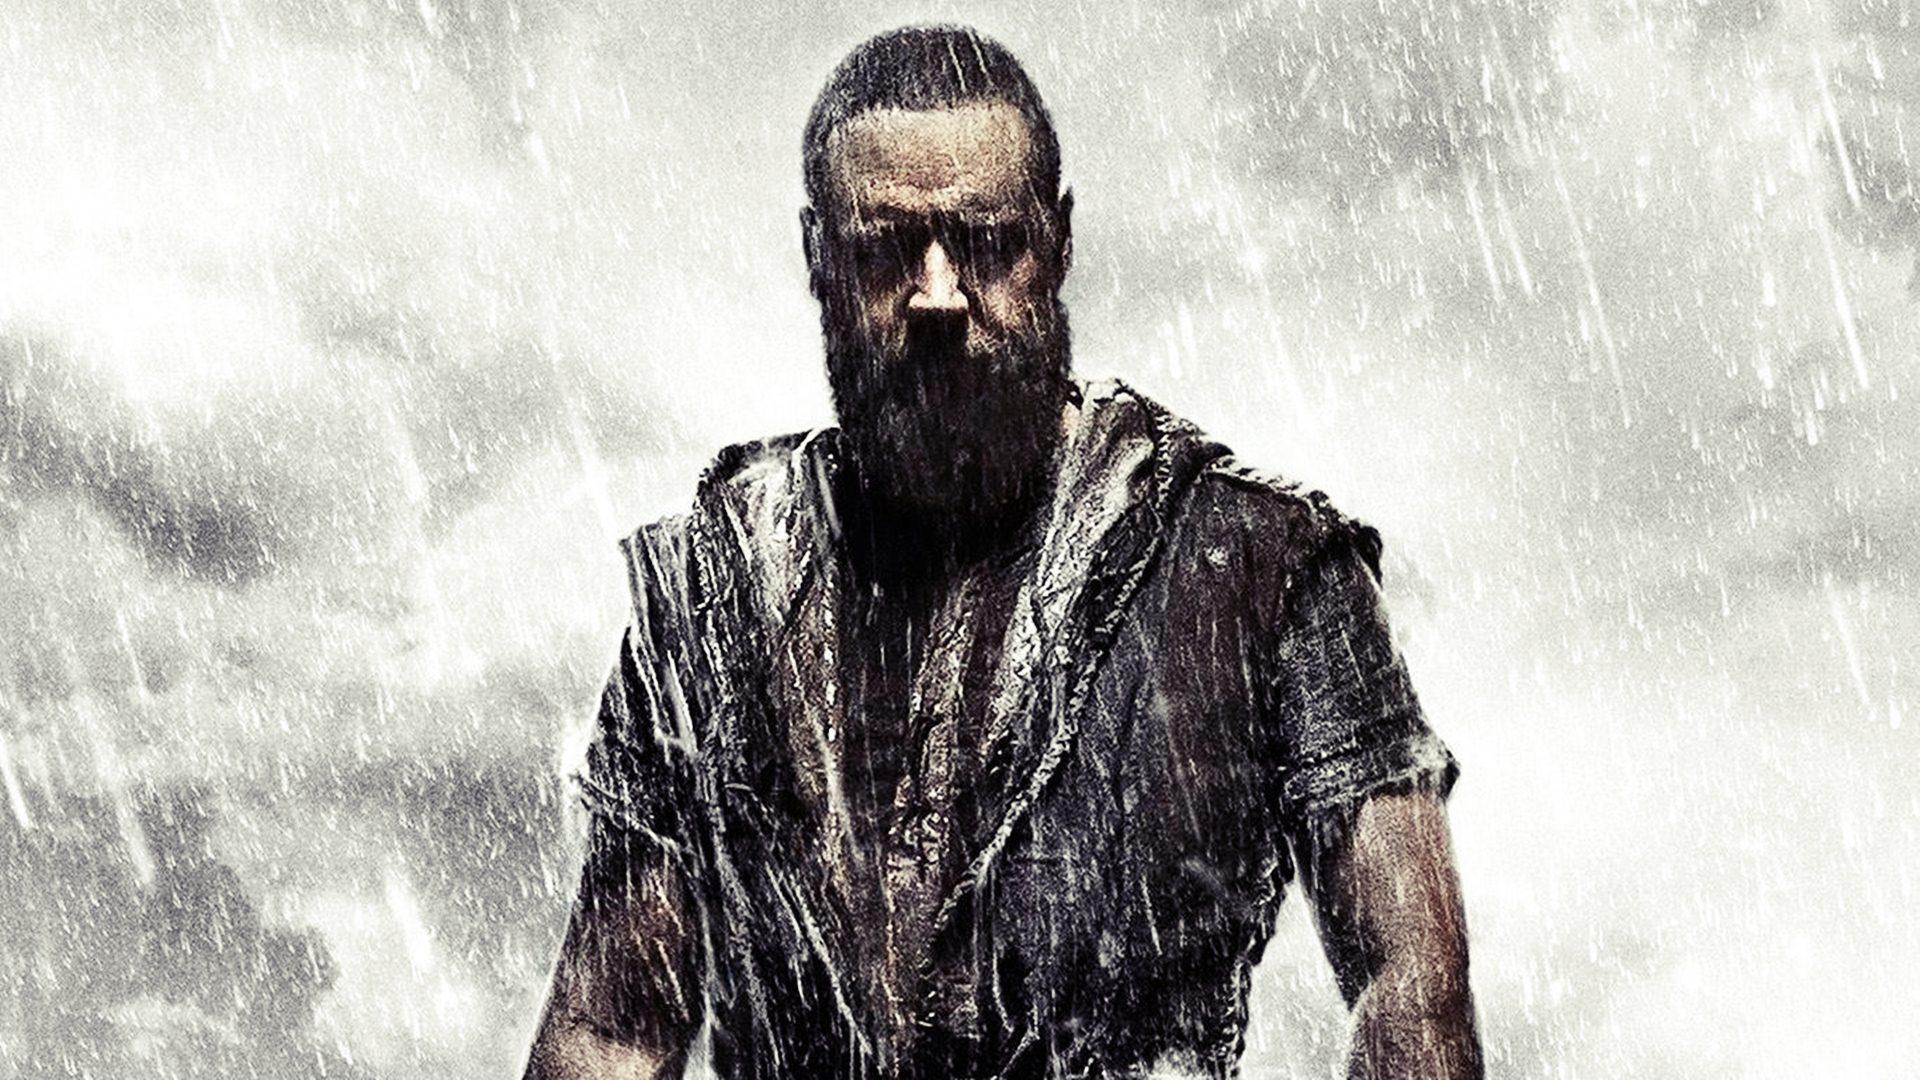 Noah Movie wallpaper 3